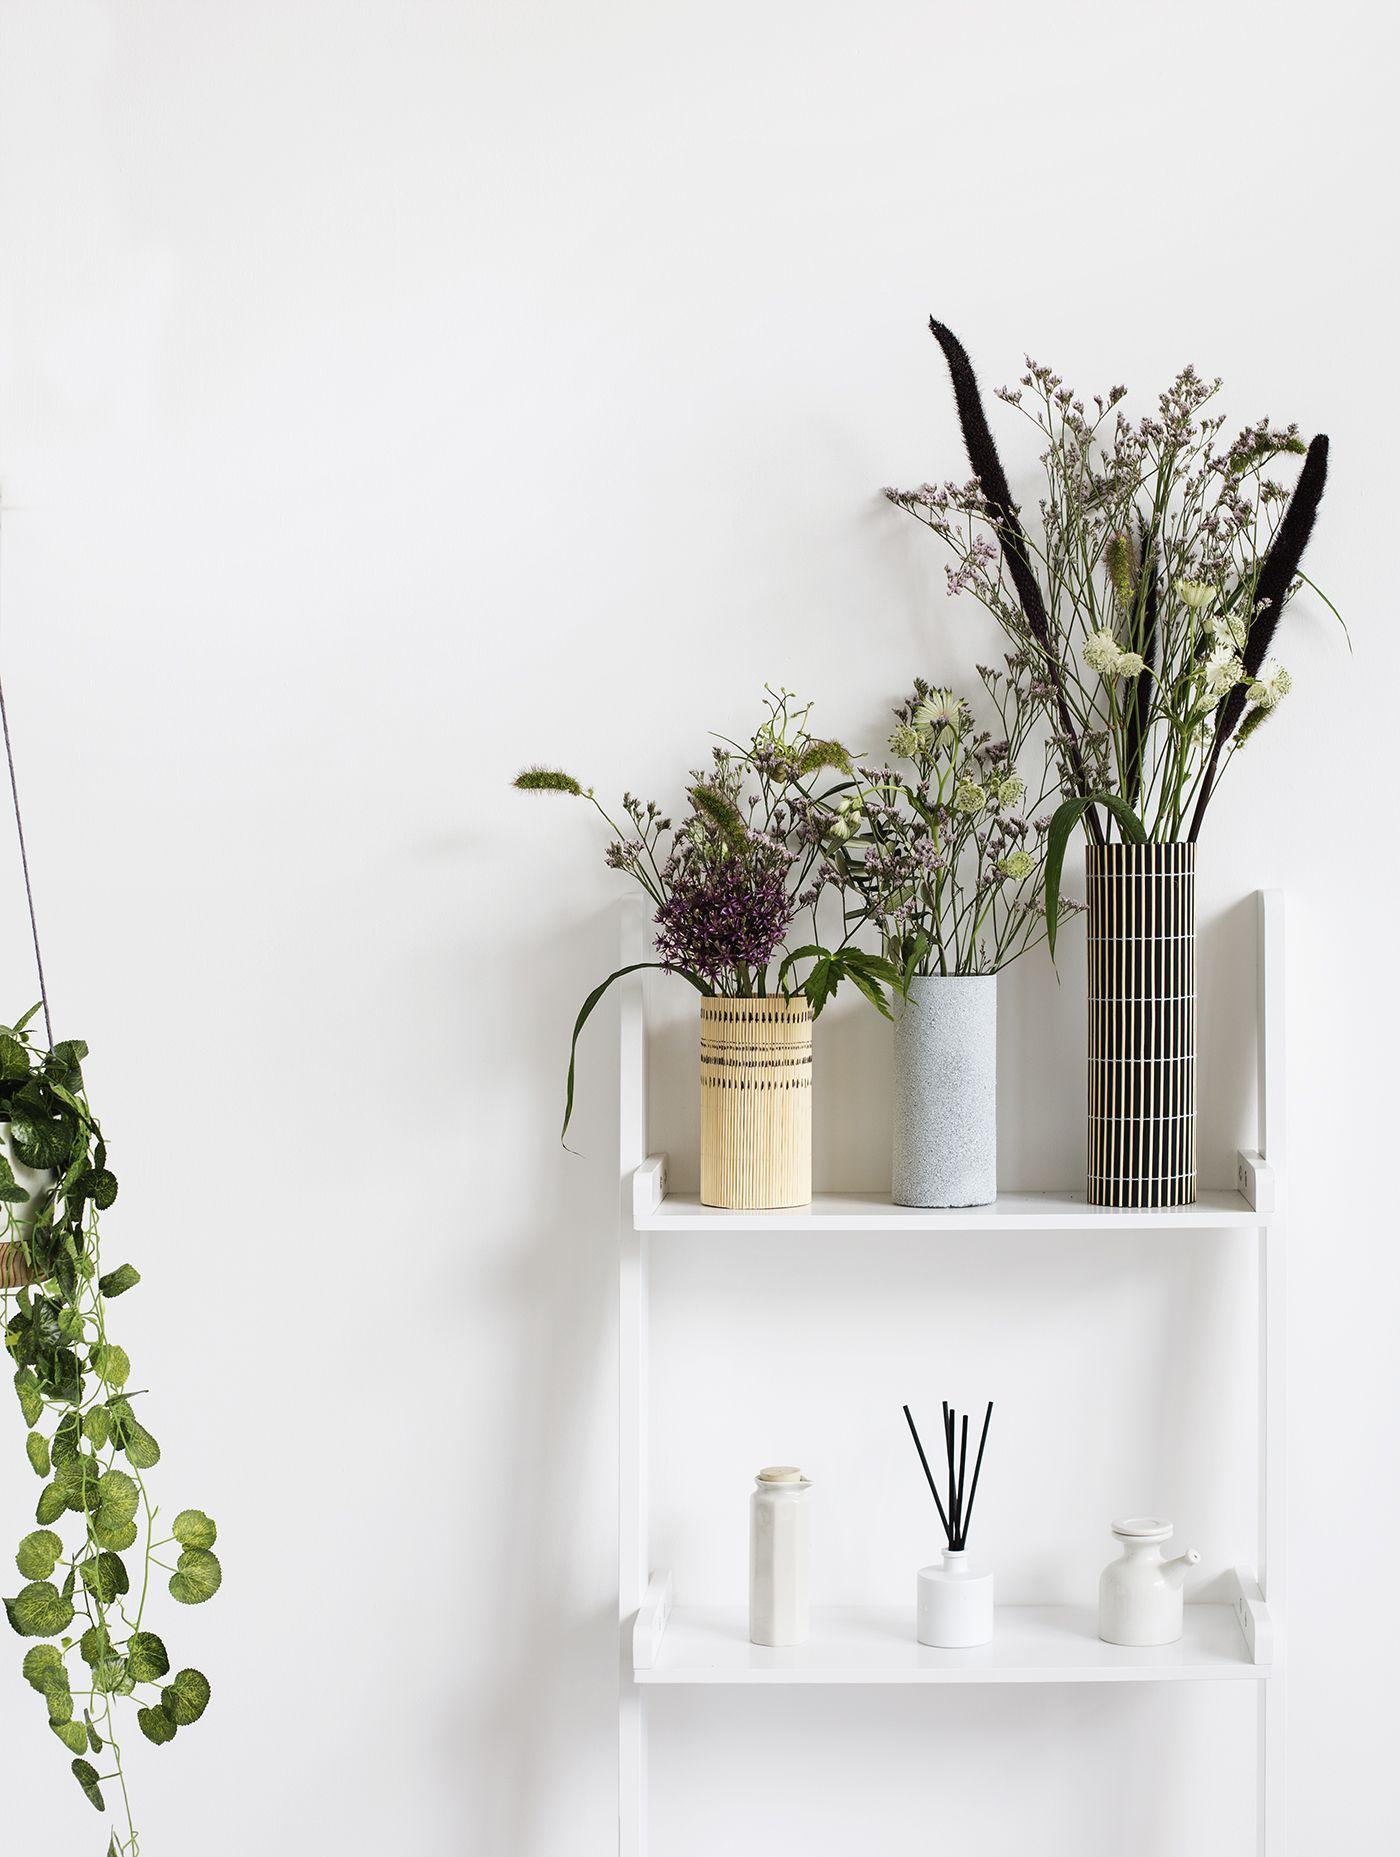 Fall boho decor woven grass vases dried flowers boho decor diy decorative vases with shurgard reviewsmspy